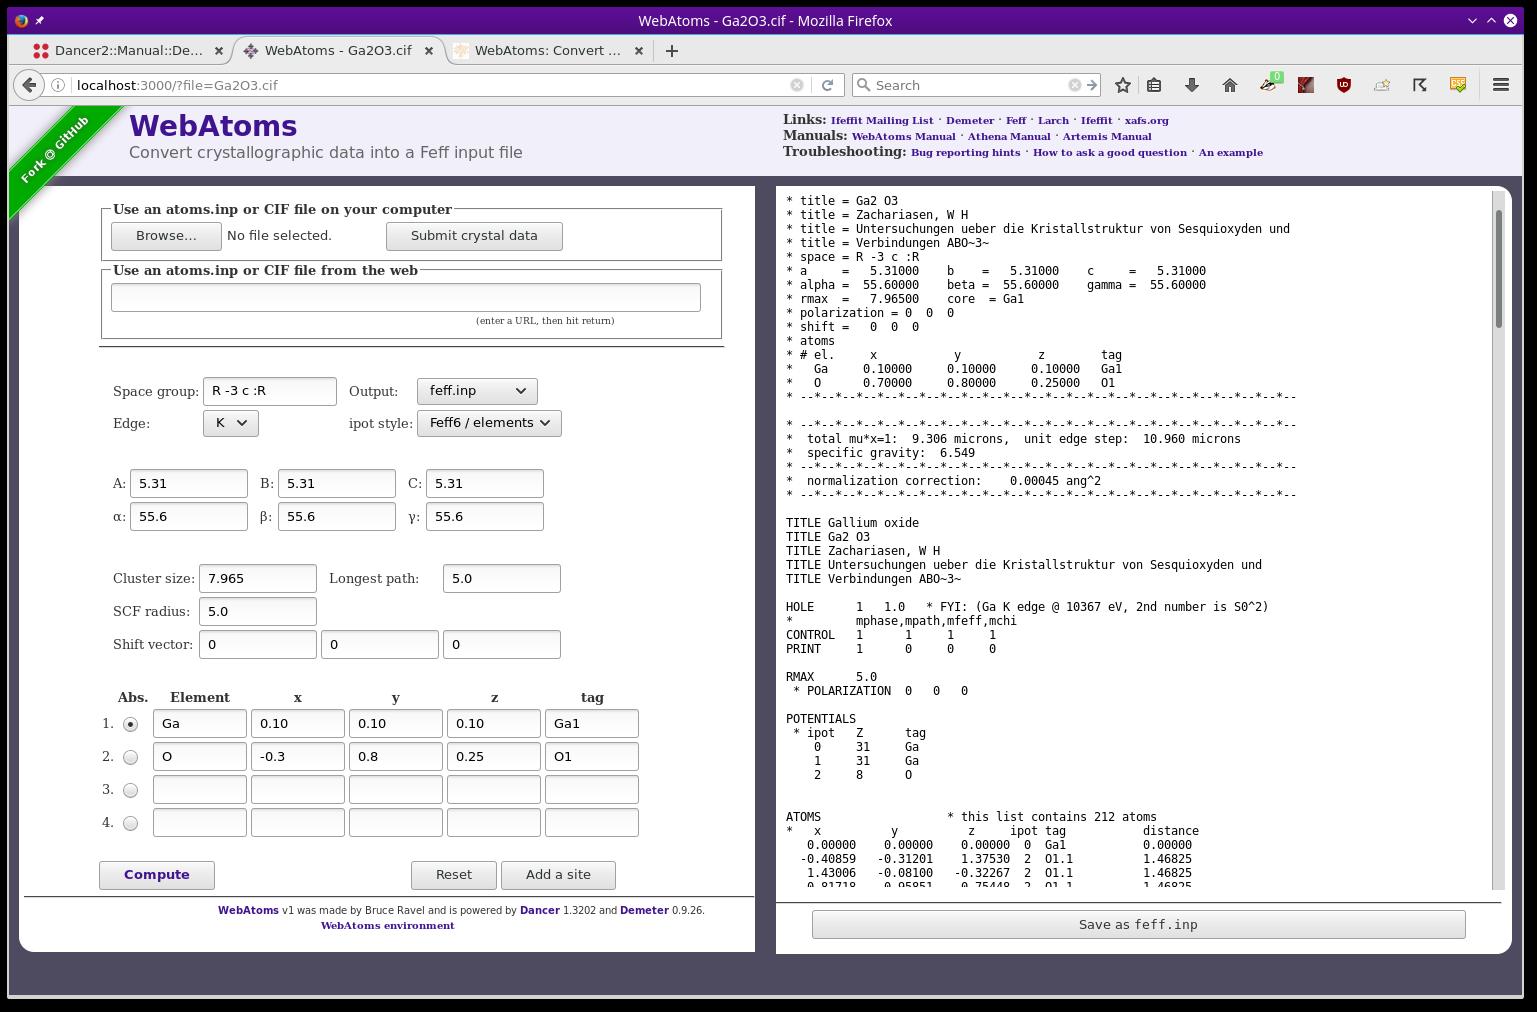 WebAtoms: Convert crystallographic data into a Feff input file